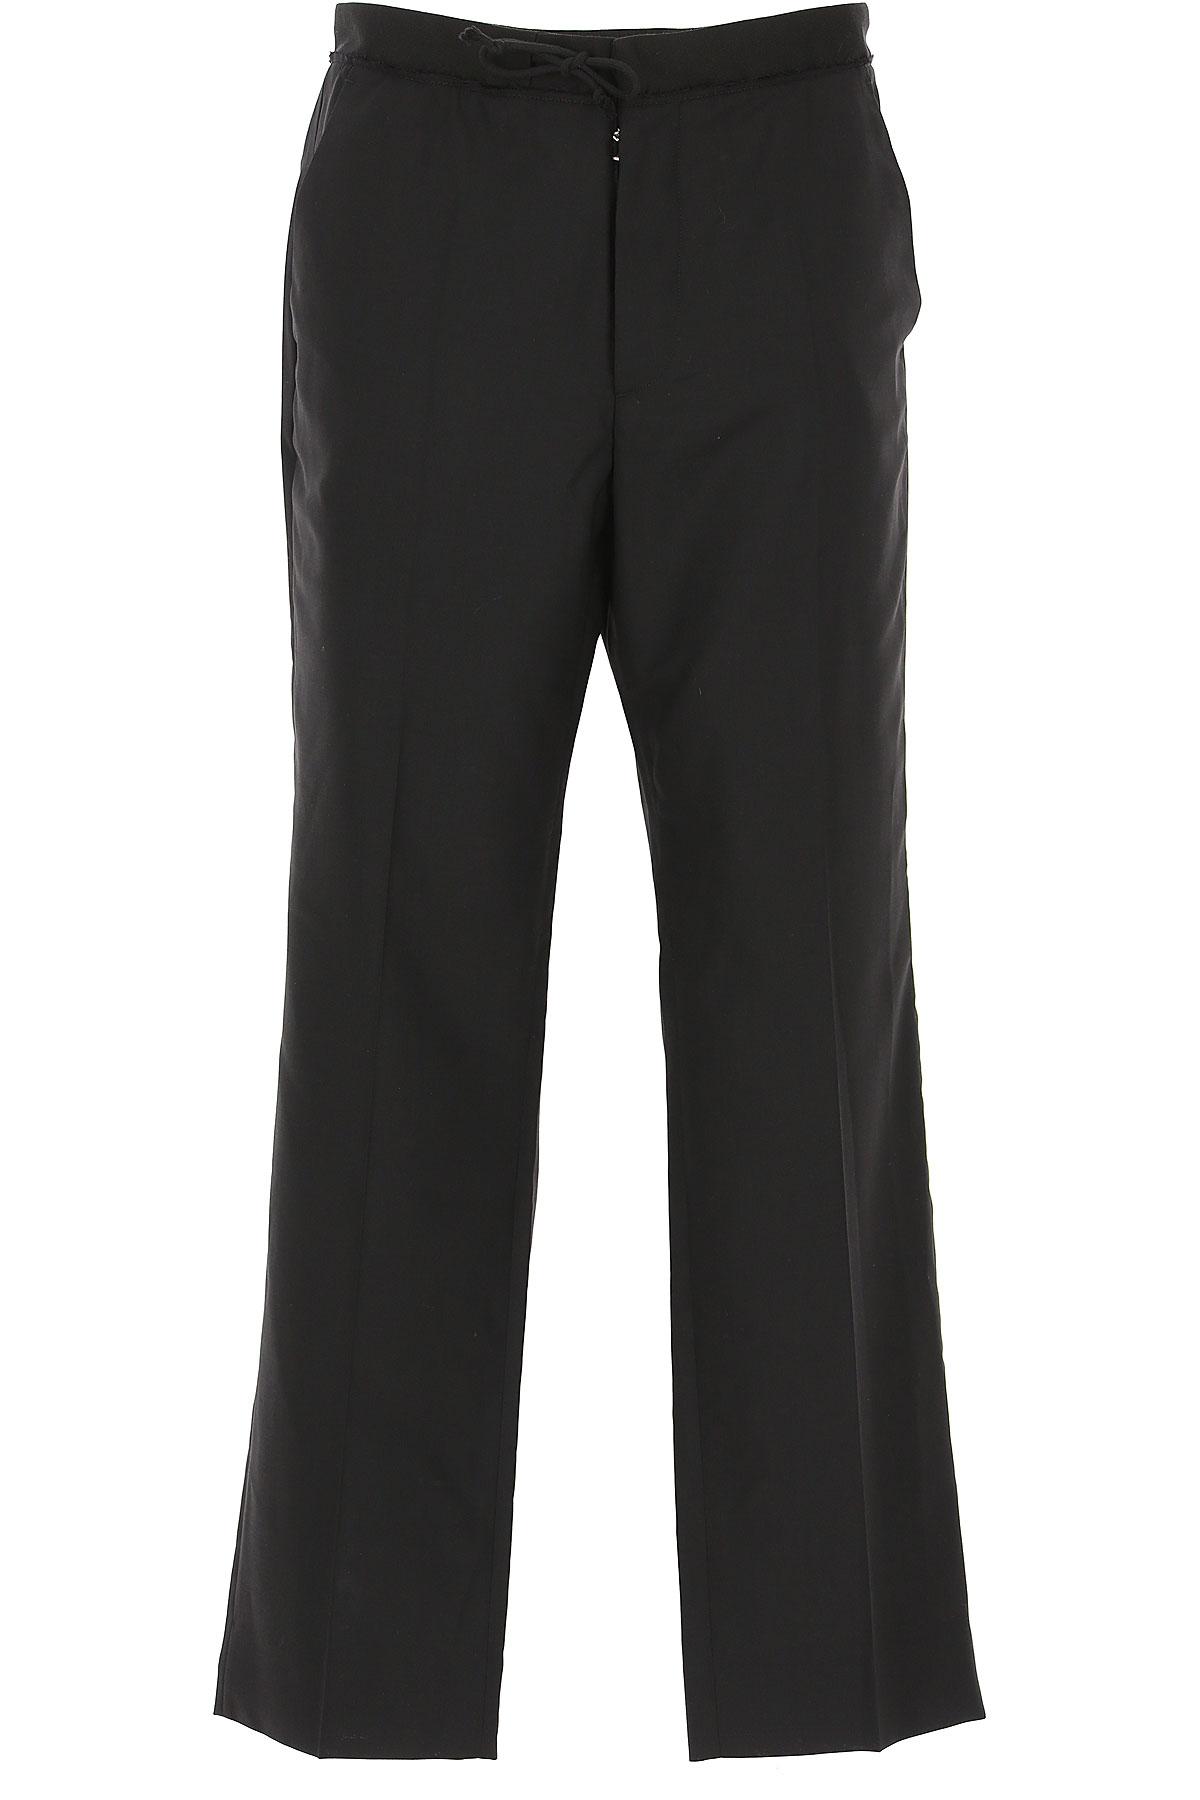 Maison Martin Margiela Pants for Men On Sale in Outlet, Black, Virgin wool, 2019, 32 34